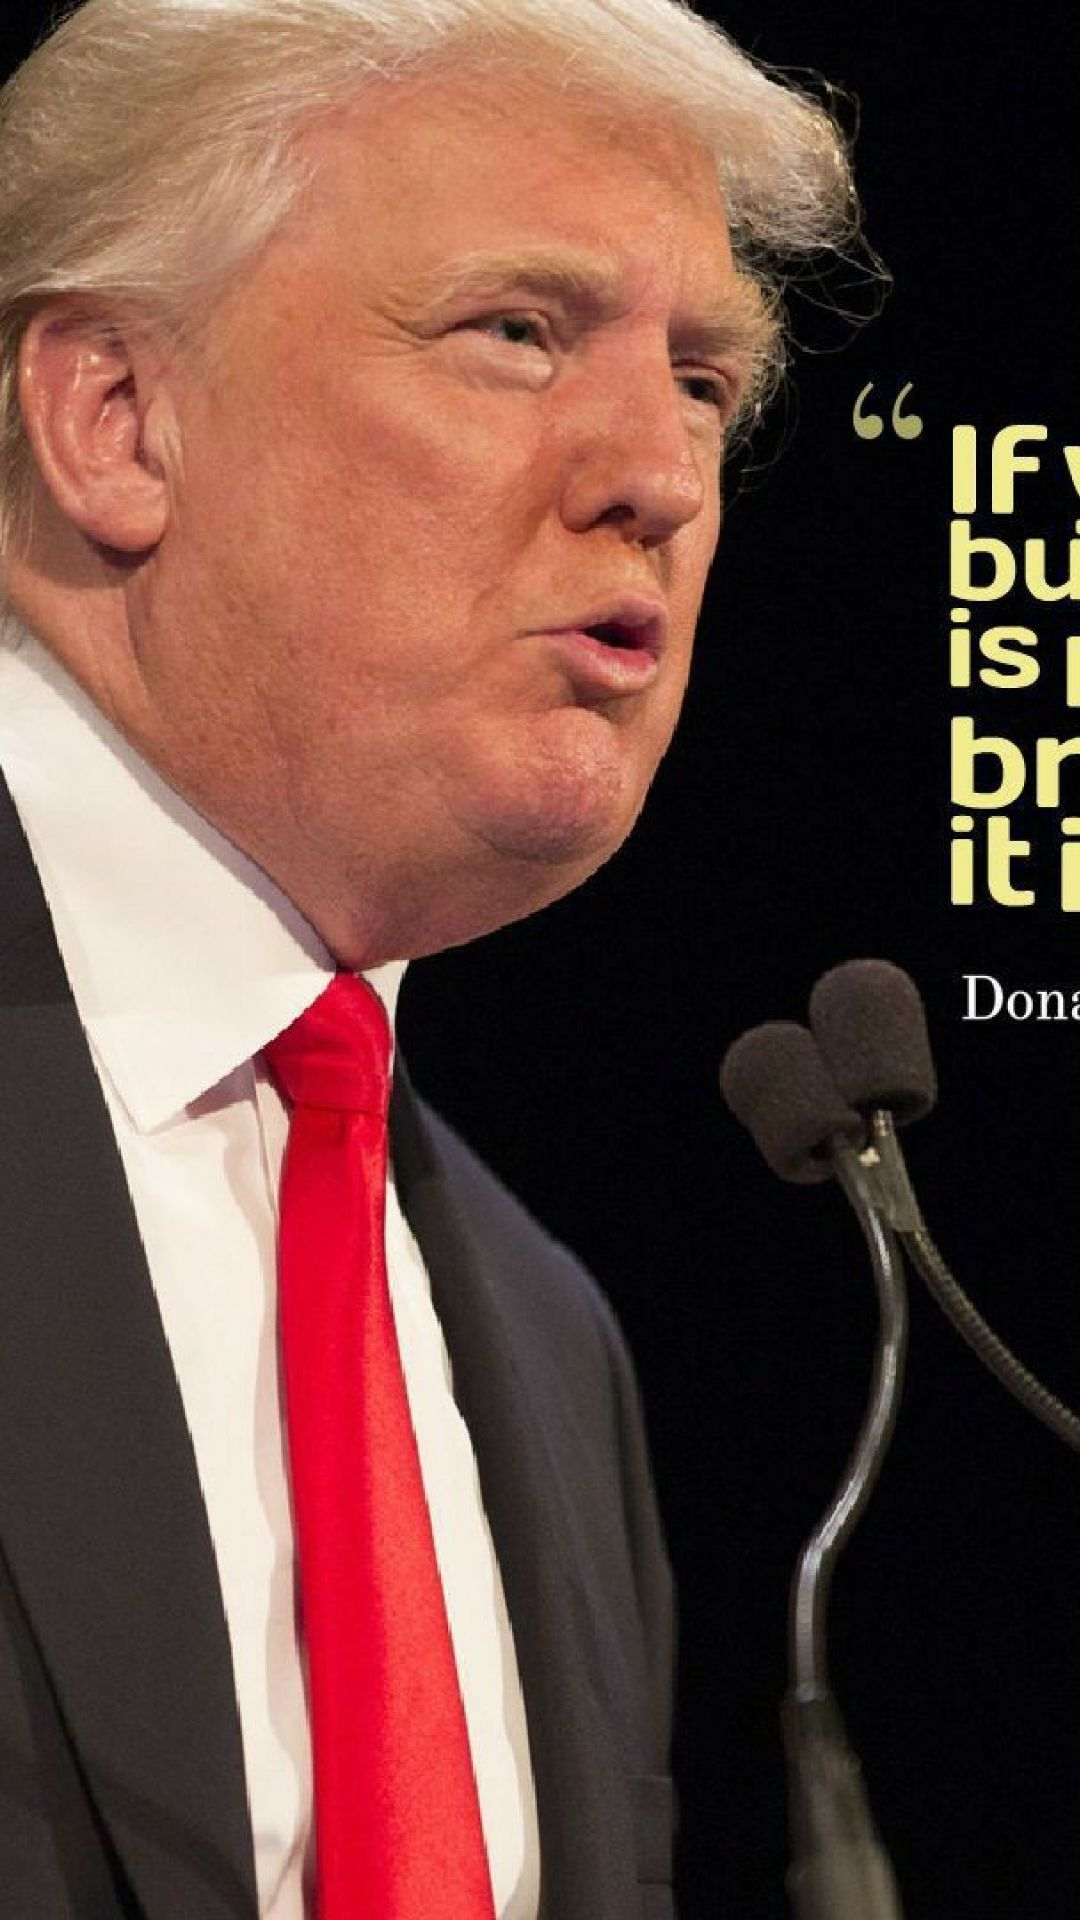 President Trump Iphone Wallpapers Top Free President Trump